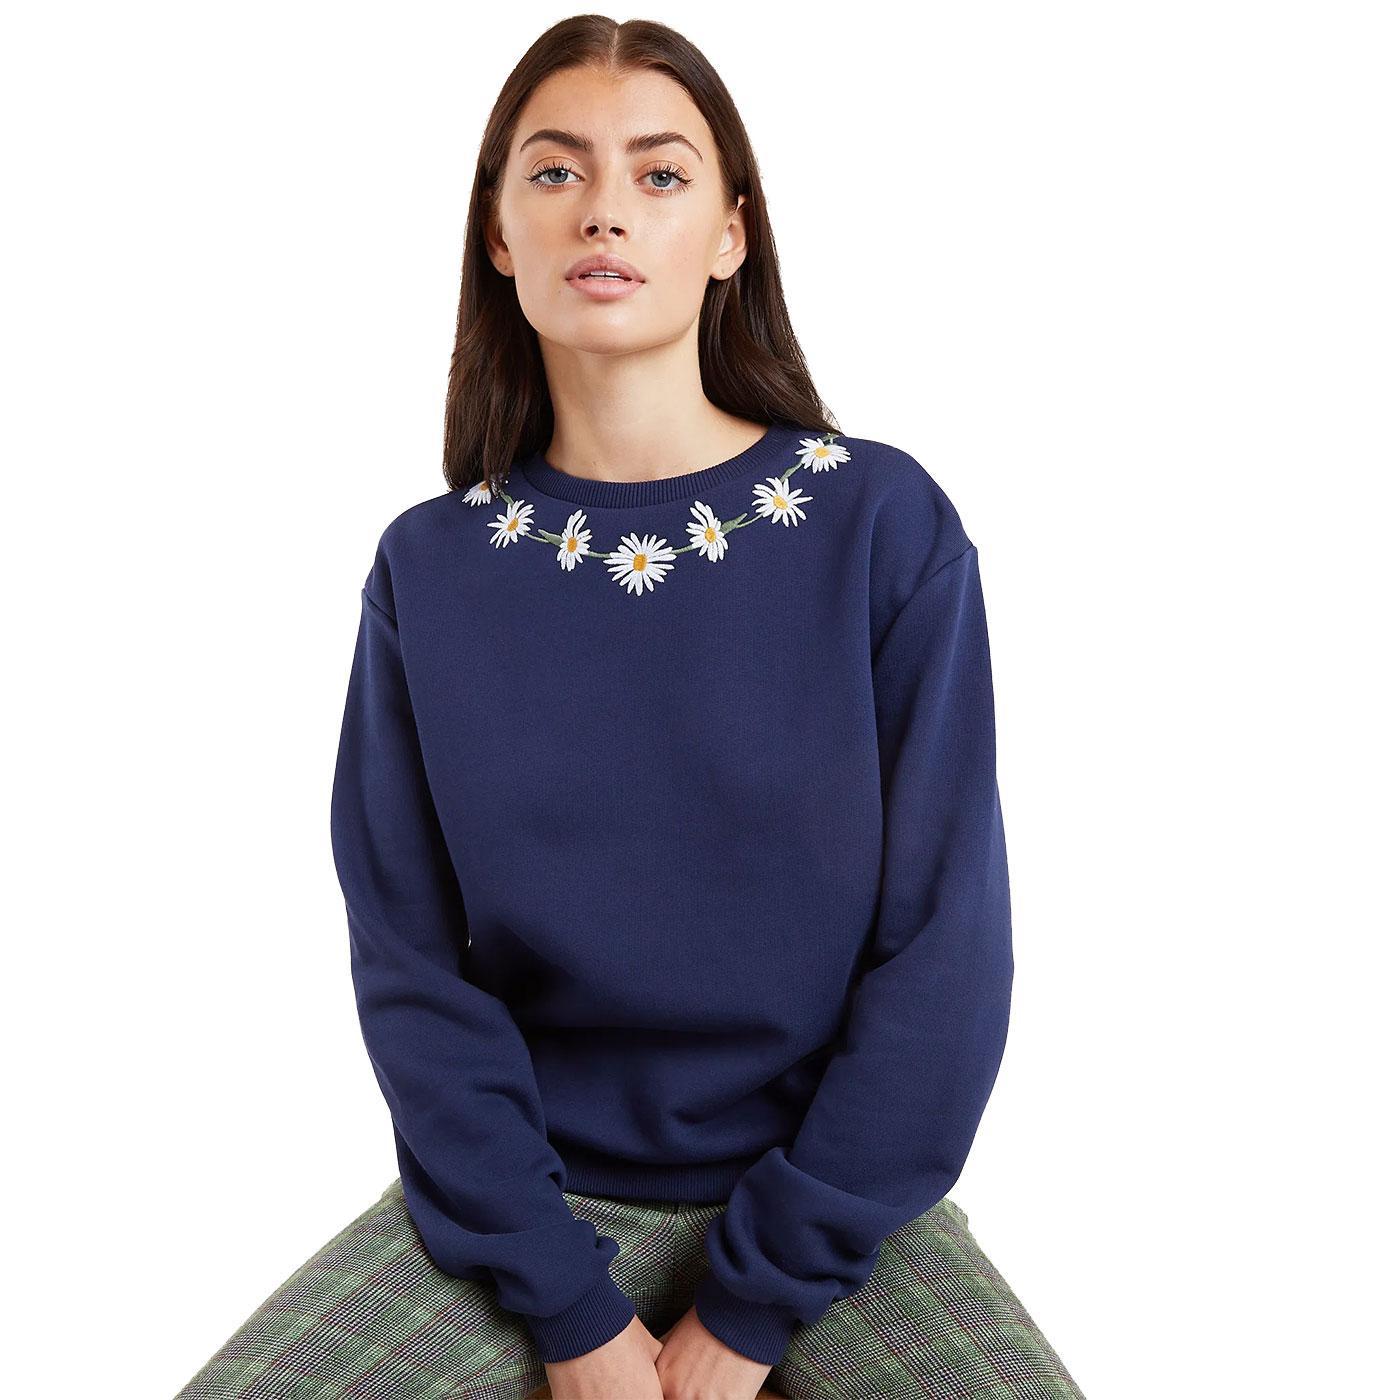 Jan LOUCHE Daisychain Embroidered Sweatshirt (N)